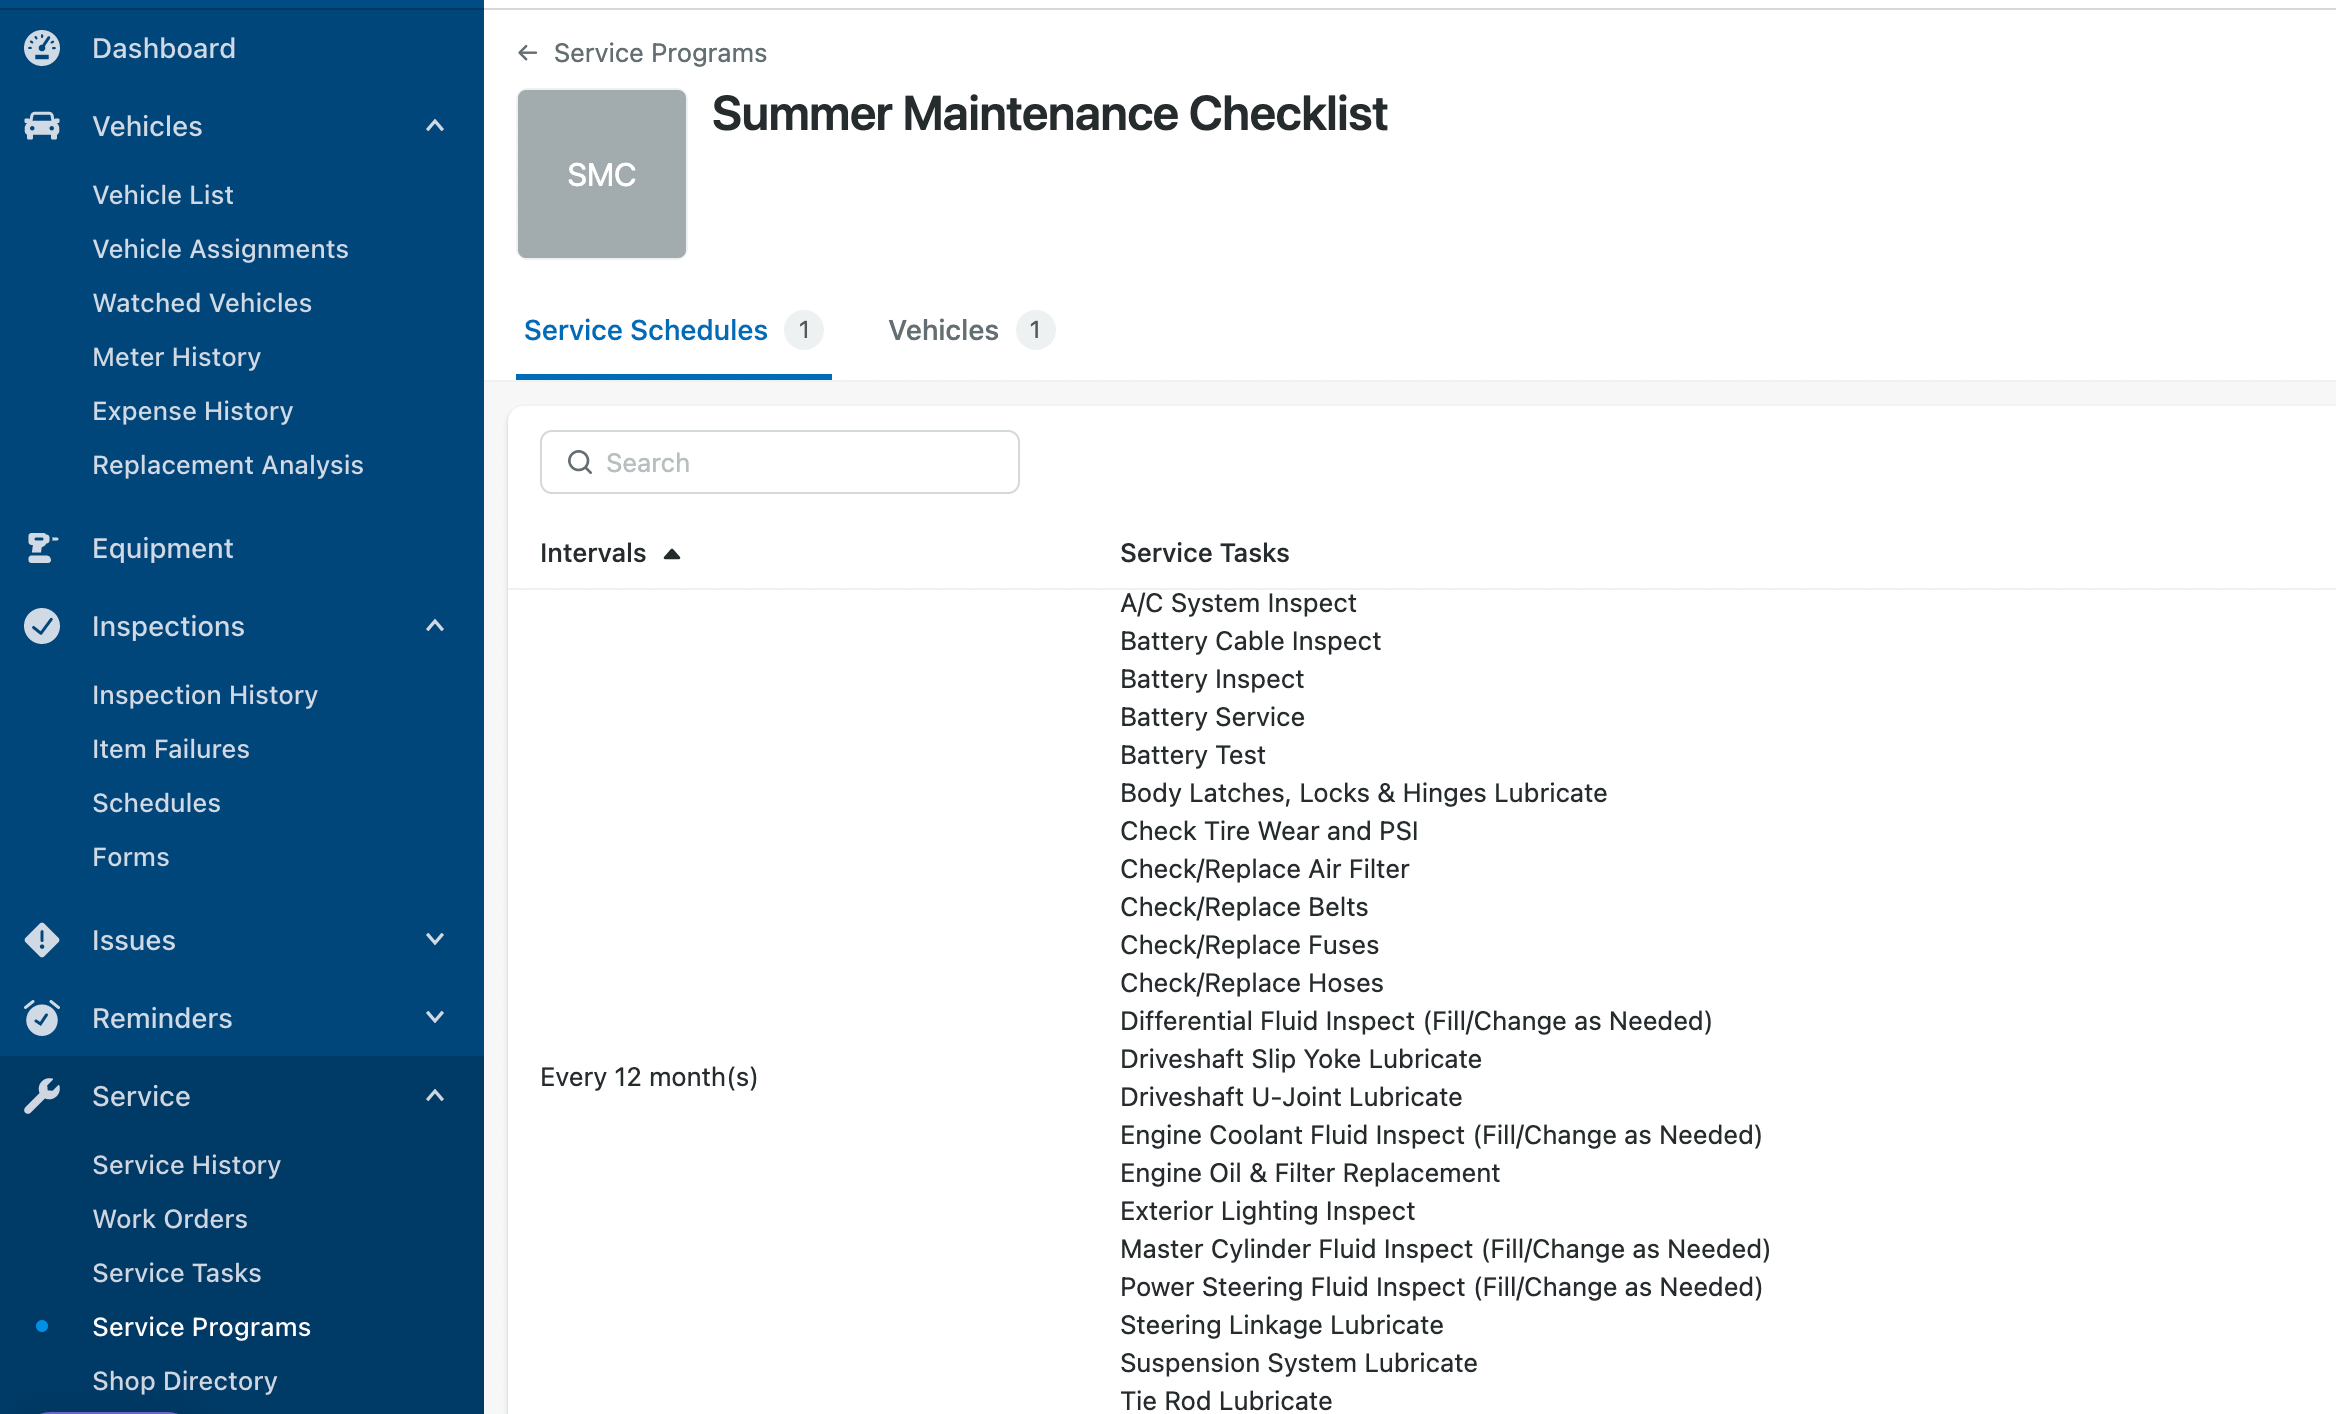 summer_checklist.png